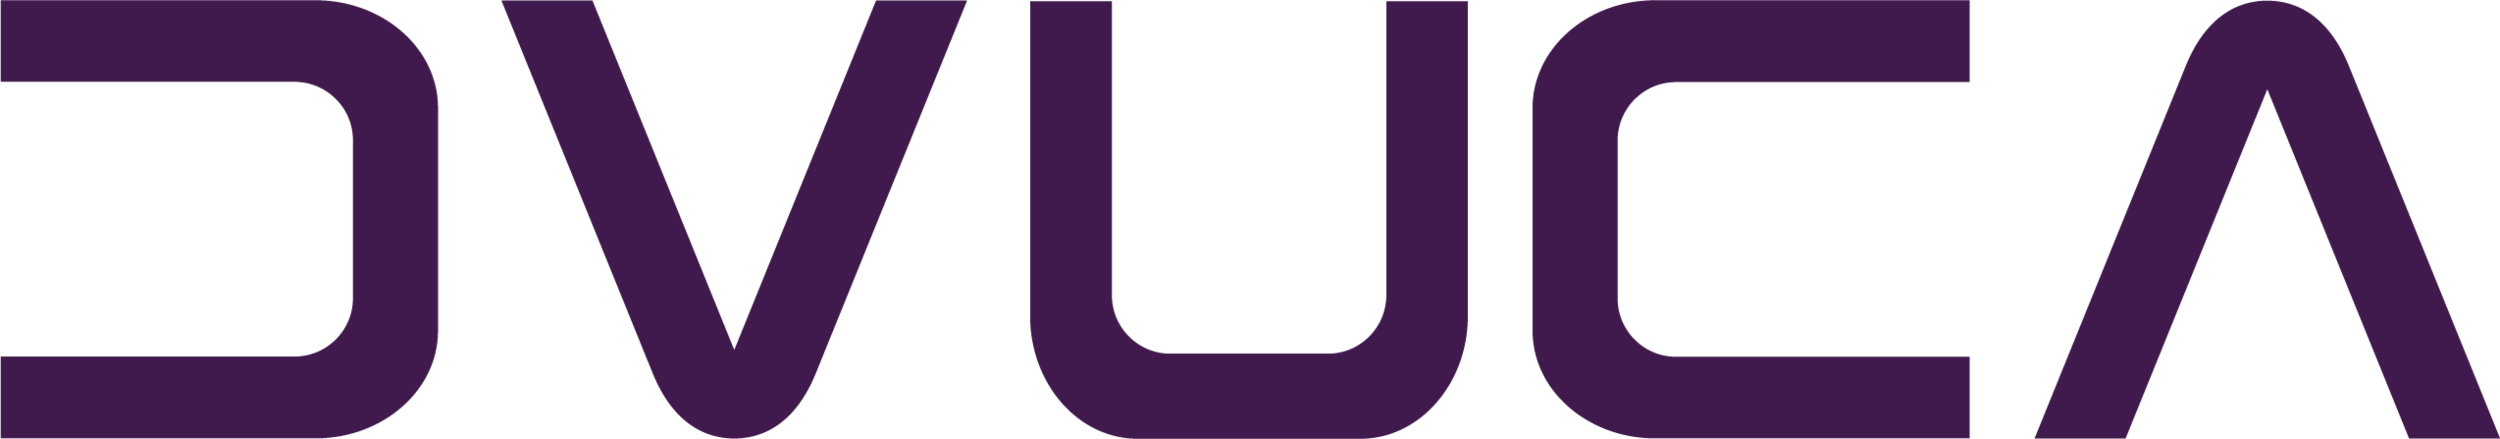 DVUCA logo final.png